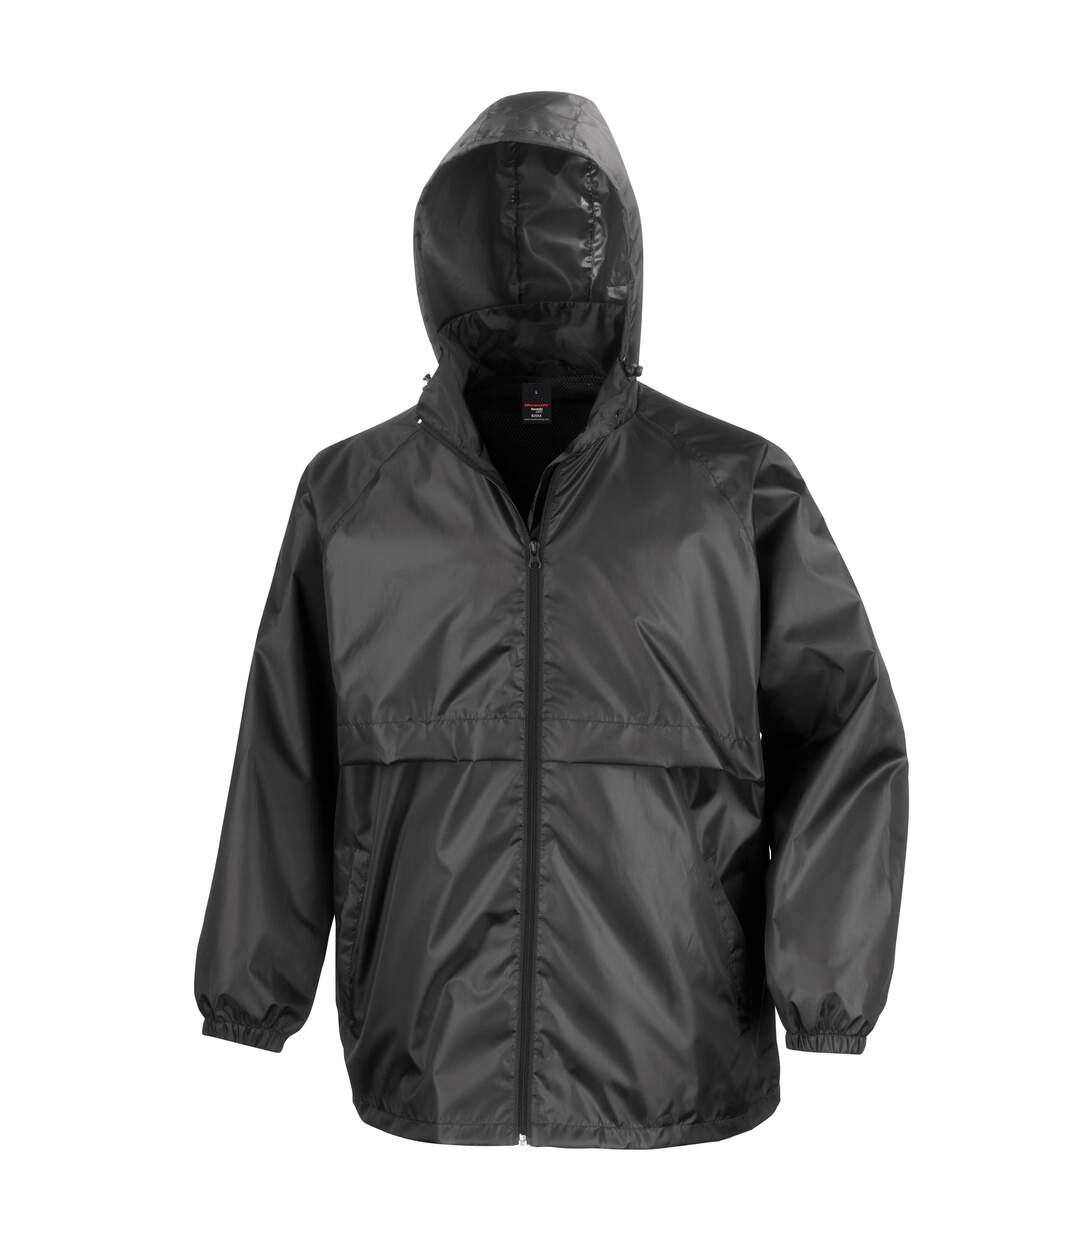 Result Mens Core Lightweight Waterproof Shield Windproof Jacket (Black) - UTBC898